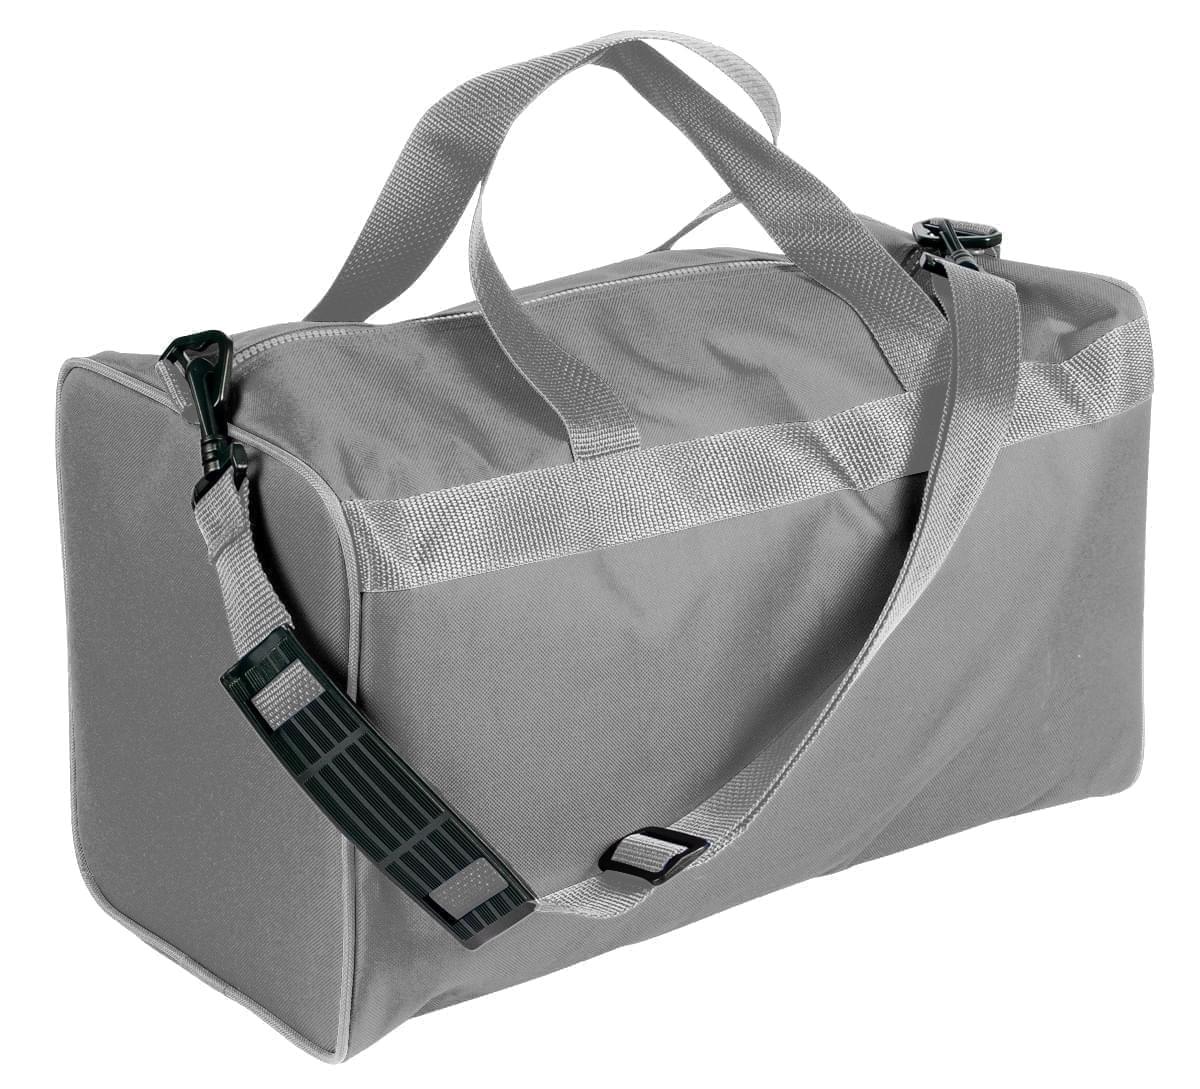 USA Made Nylon Poly Weekend Duffles, Grey-Grey, WLKX31AA1U